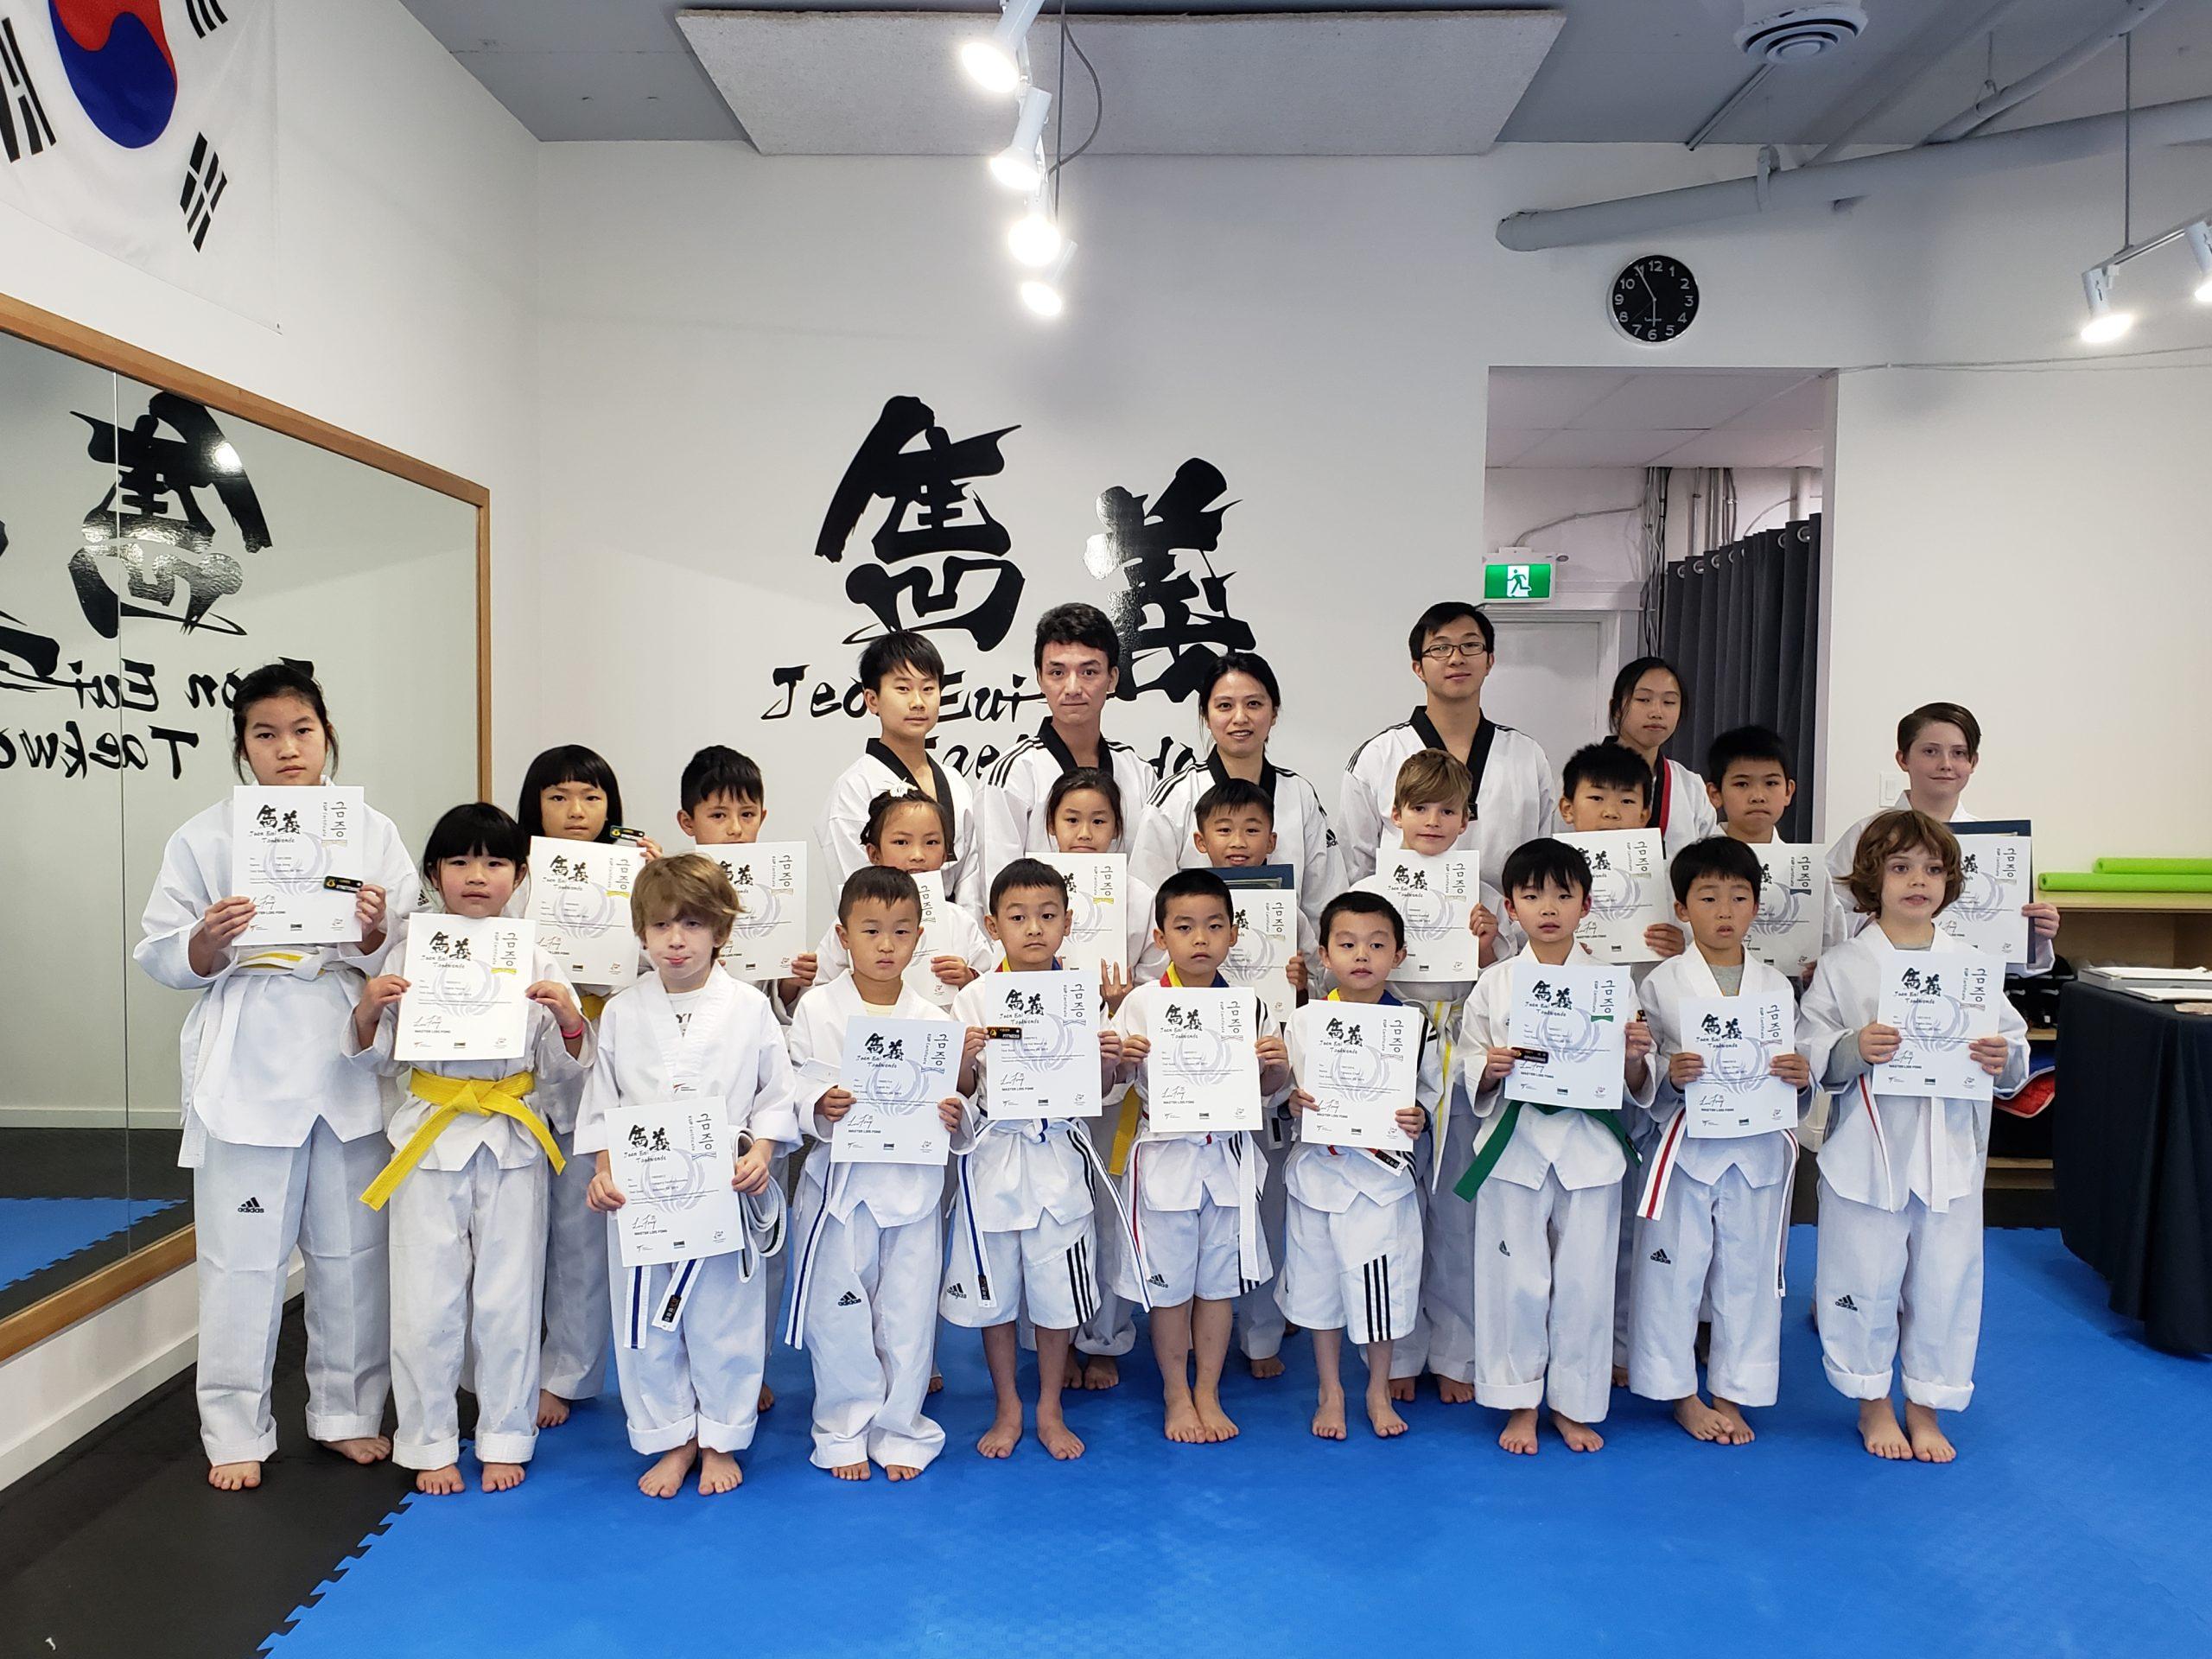 Promotion Test in October 2019